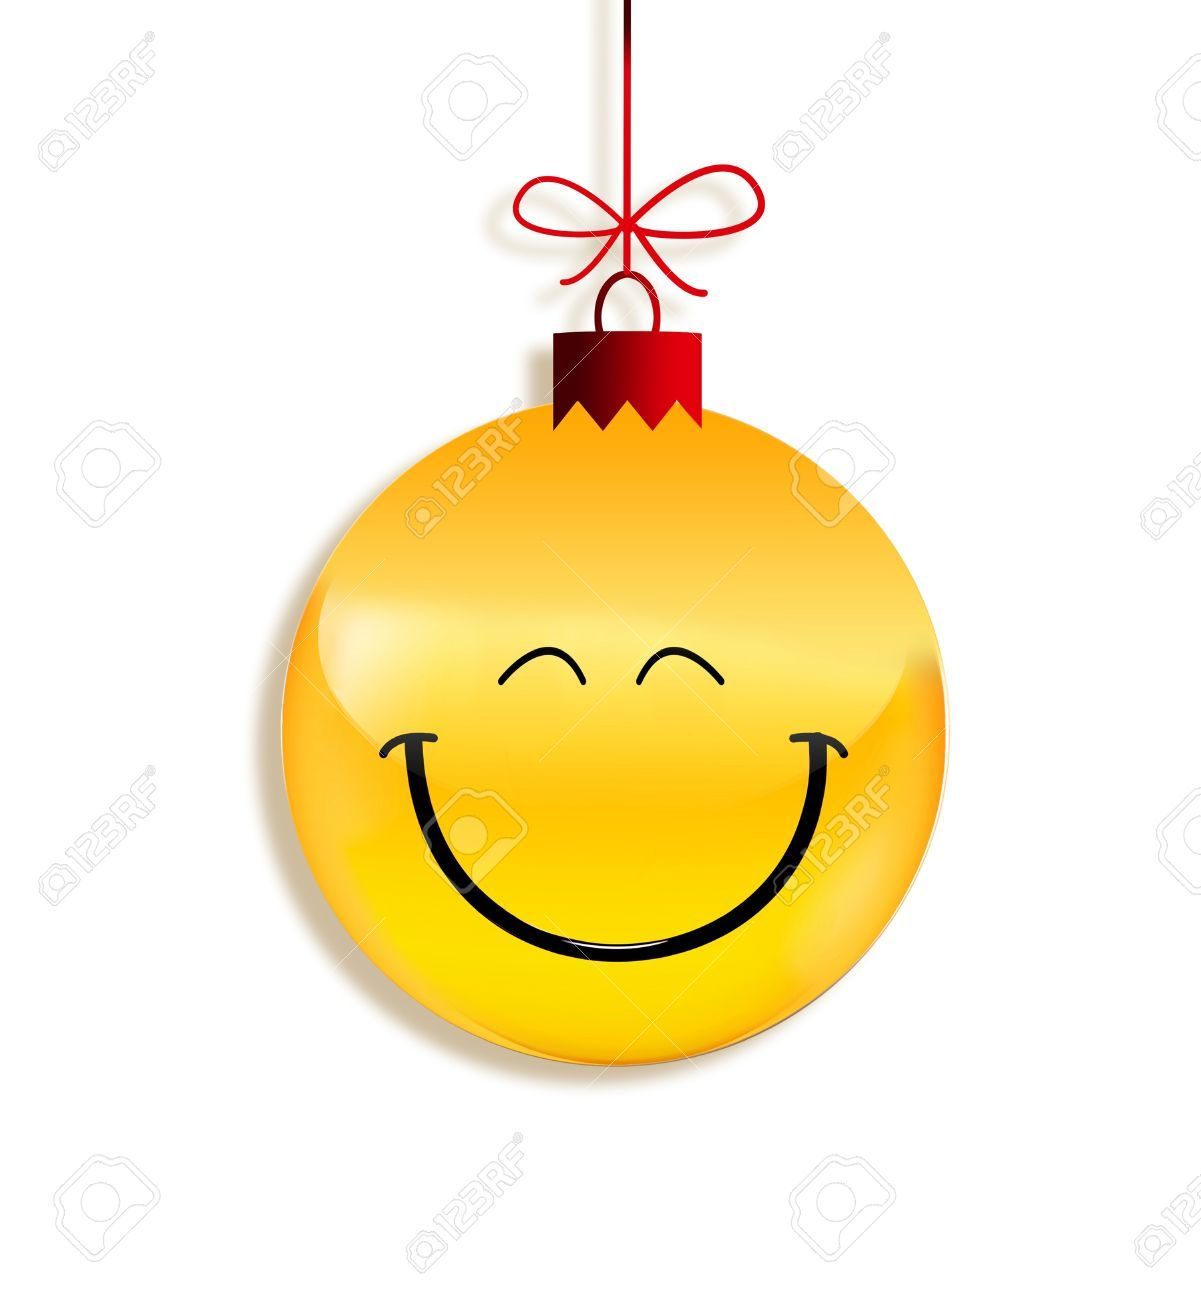 christmas smiley faces: paper emoticon as Christmas ball.